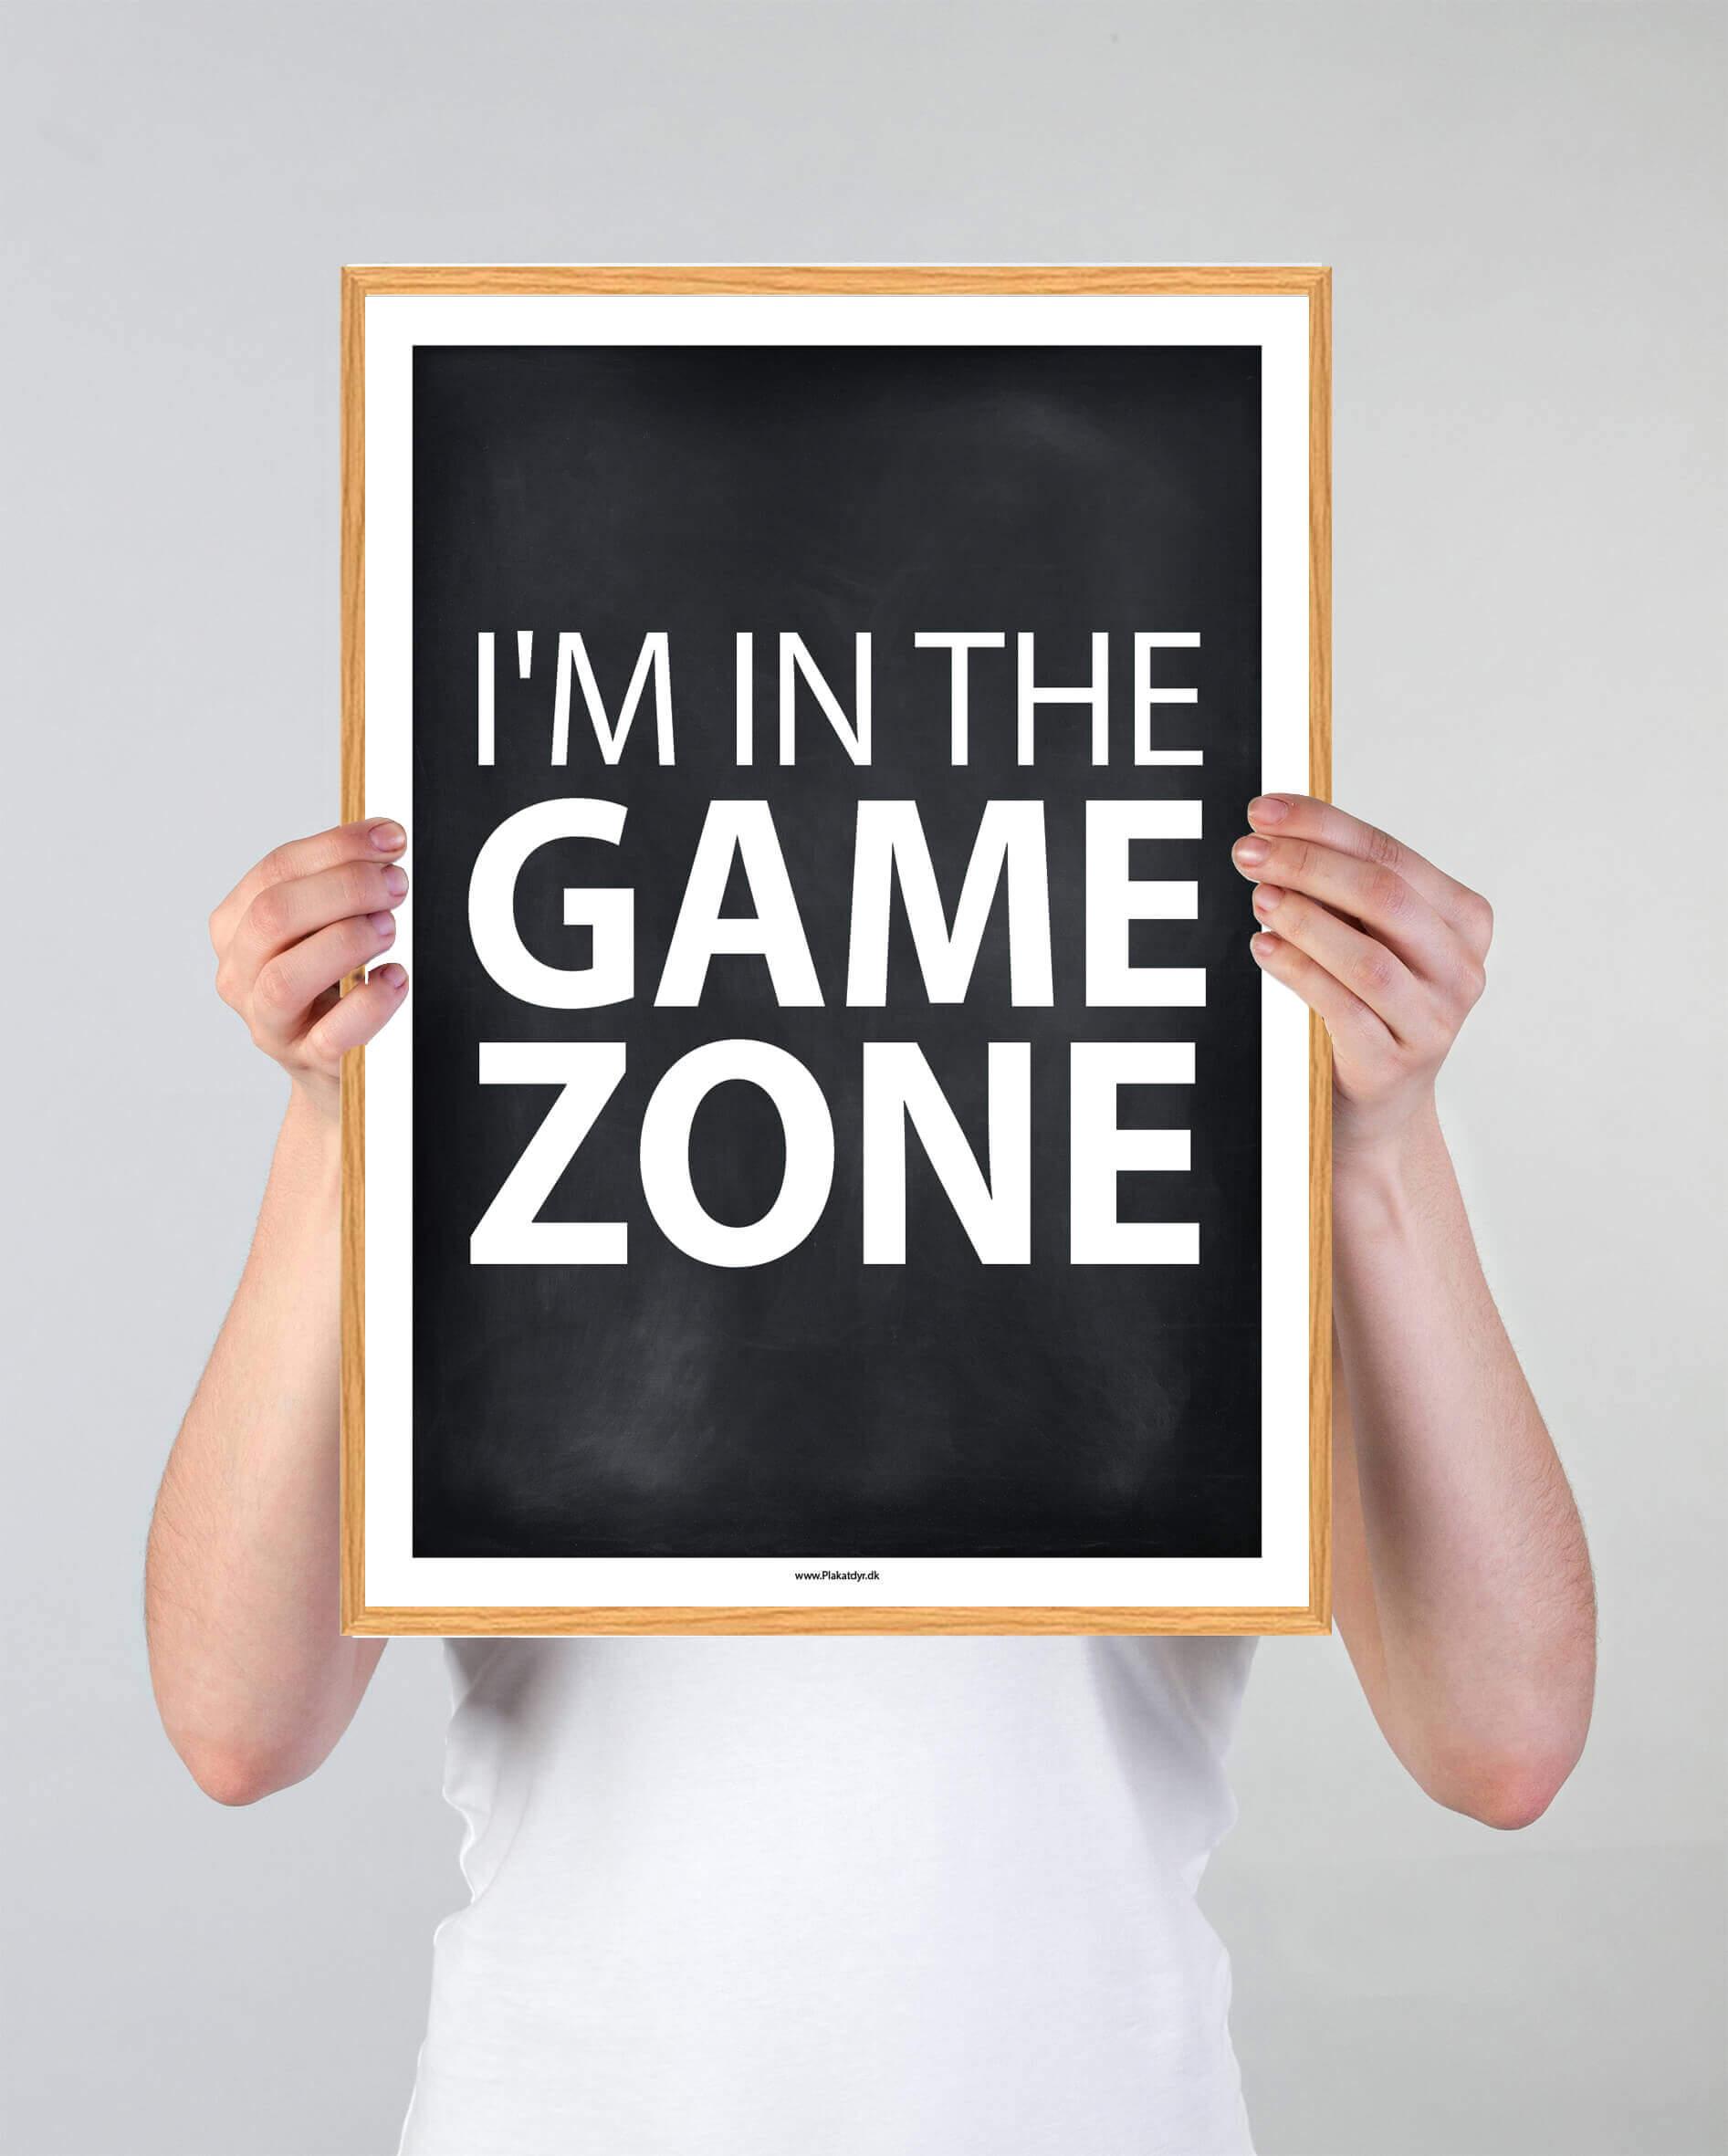 Gamer-I'm-in-the-game-zone-2